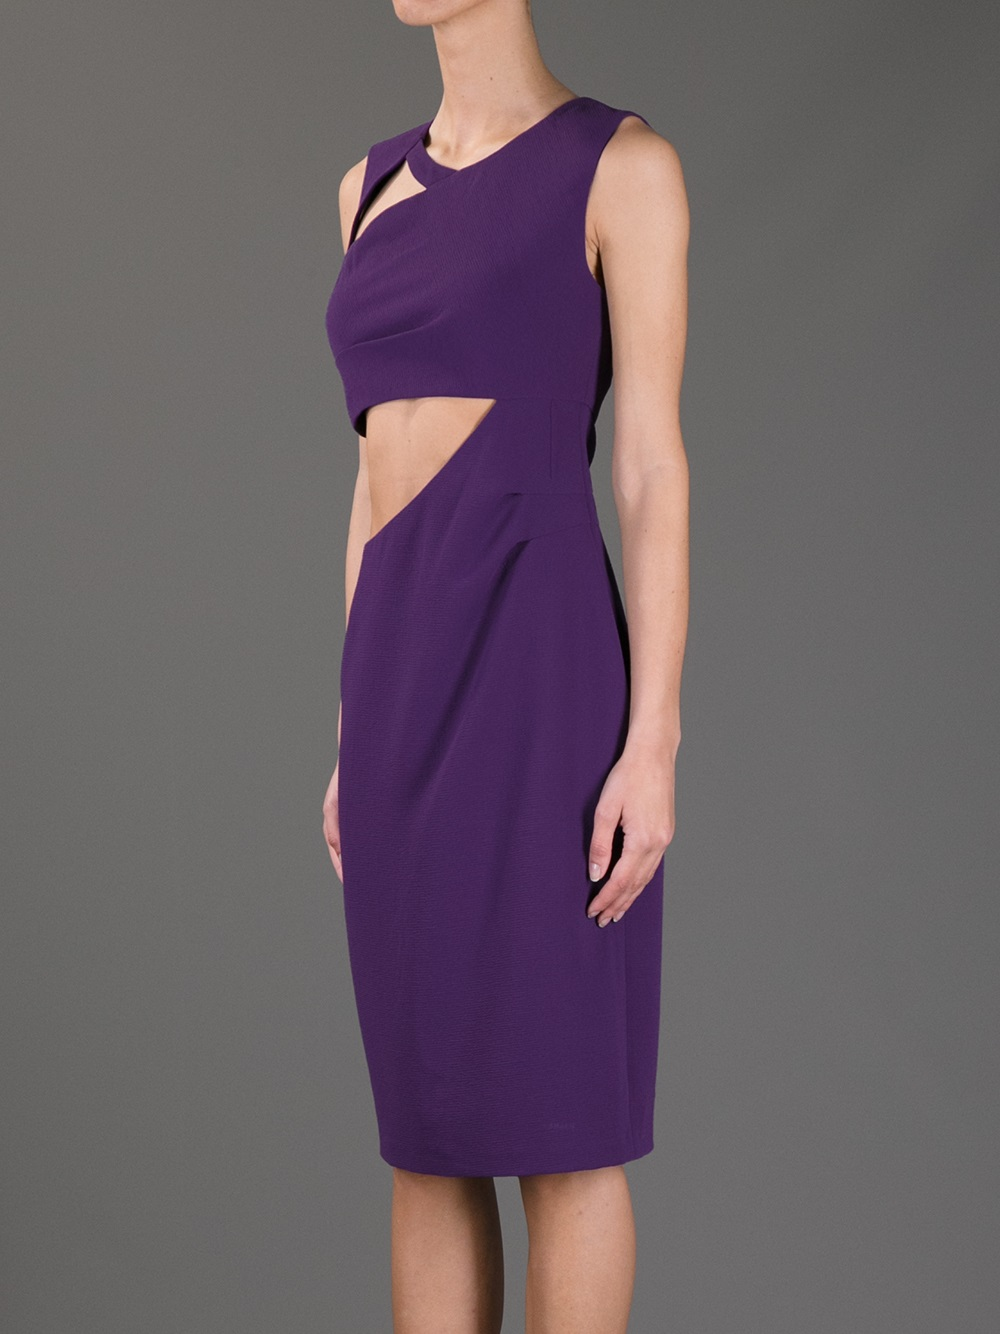 8f382c03f65f Lyst - BCBGMAXAZRIA Cutout Bodycon Dress in Purple